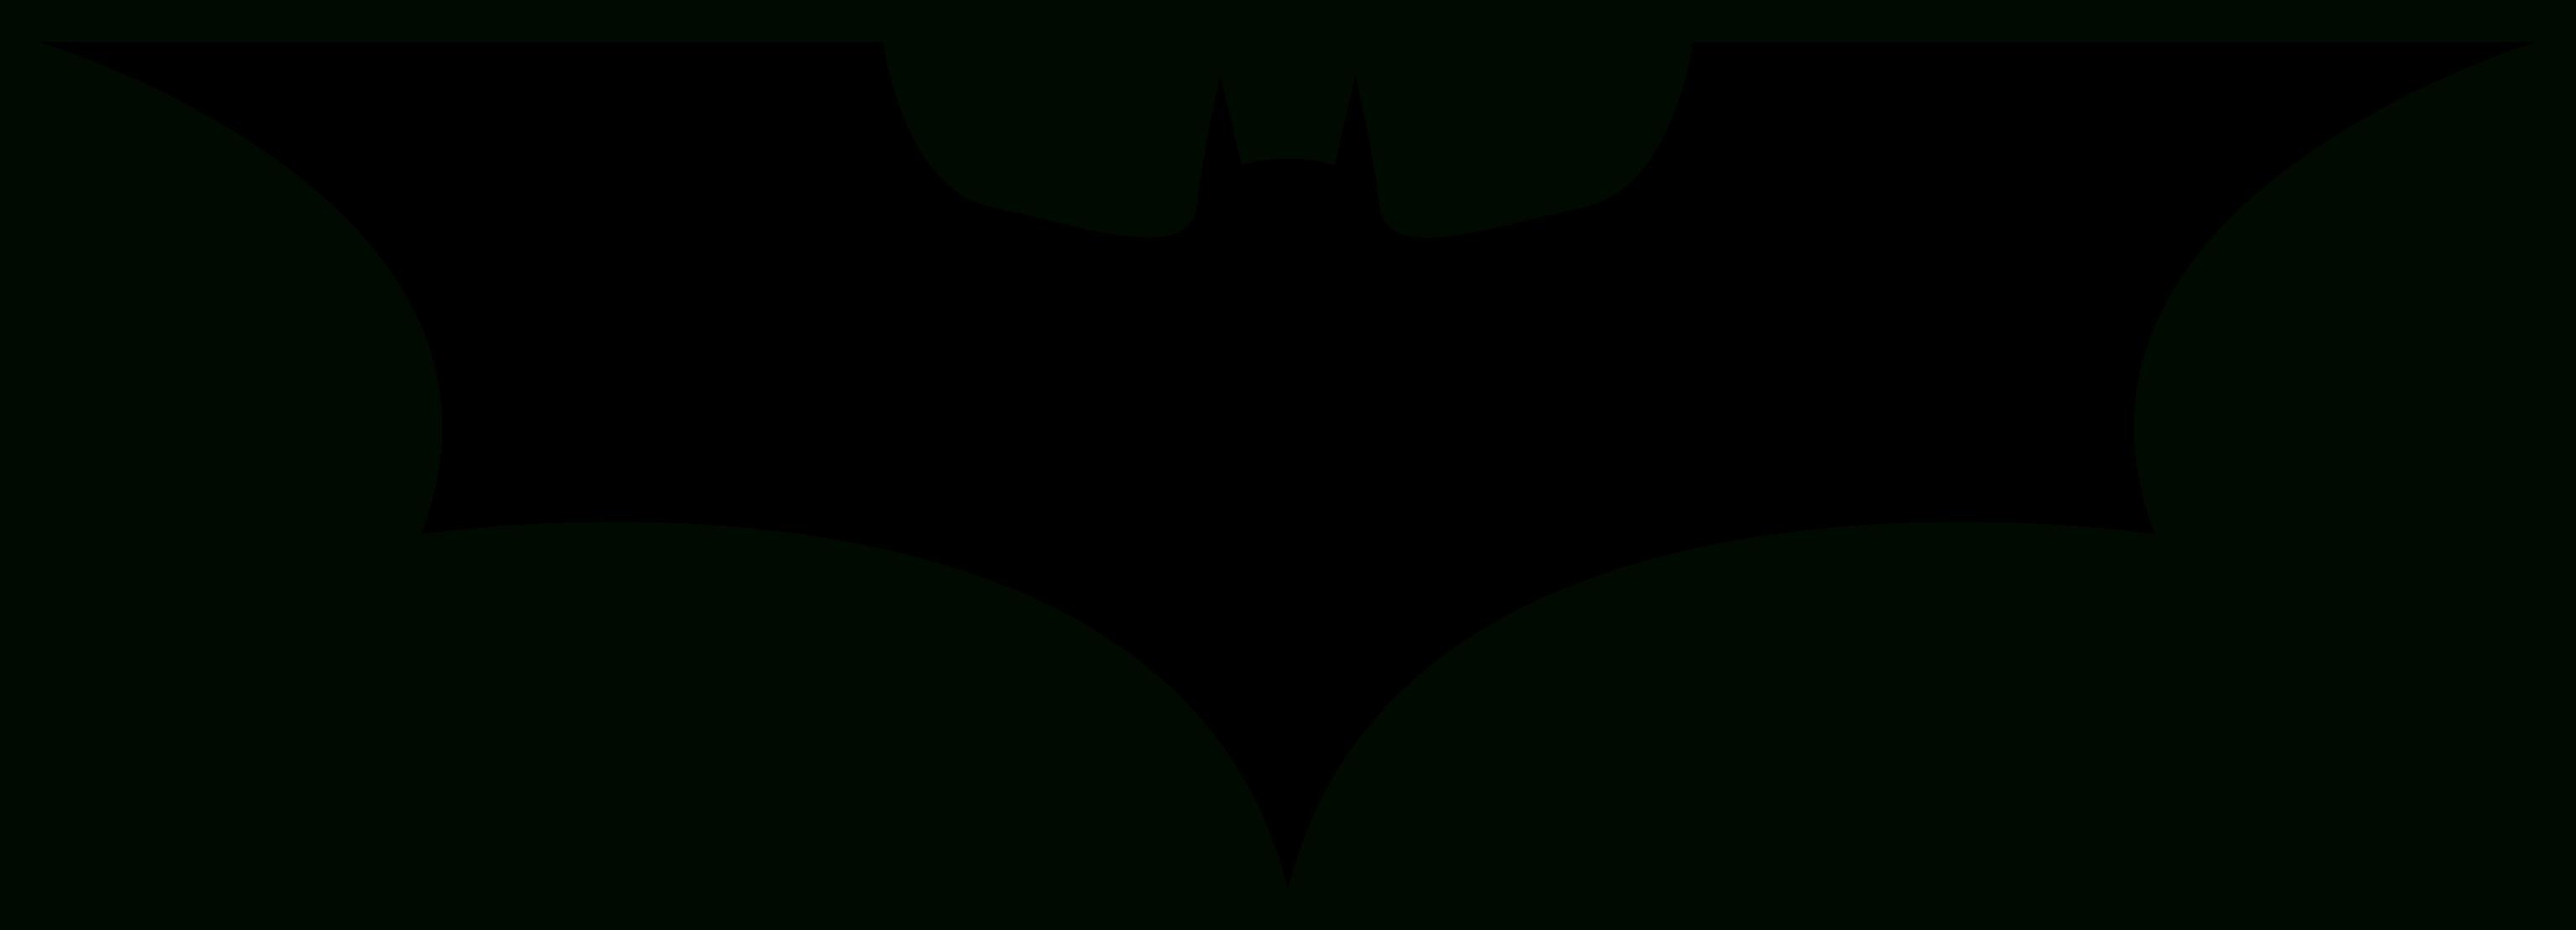 bat symbol stencil batman pic | nicky | pinterest | stenciling